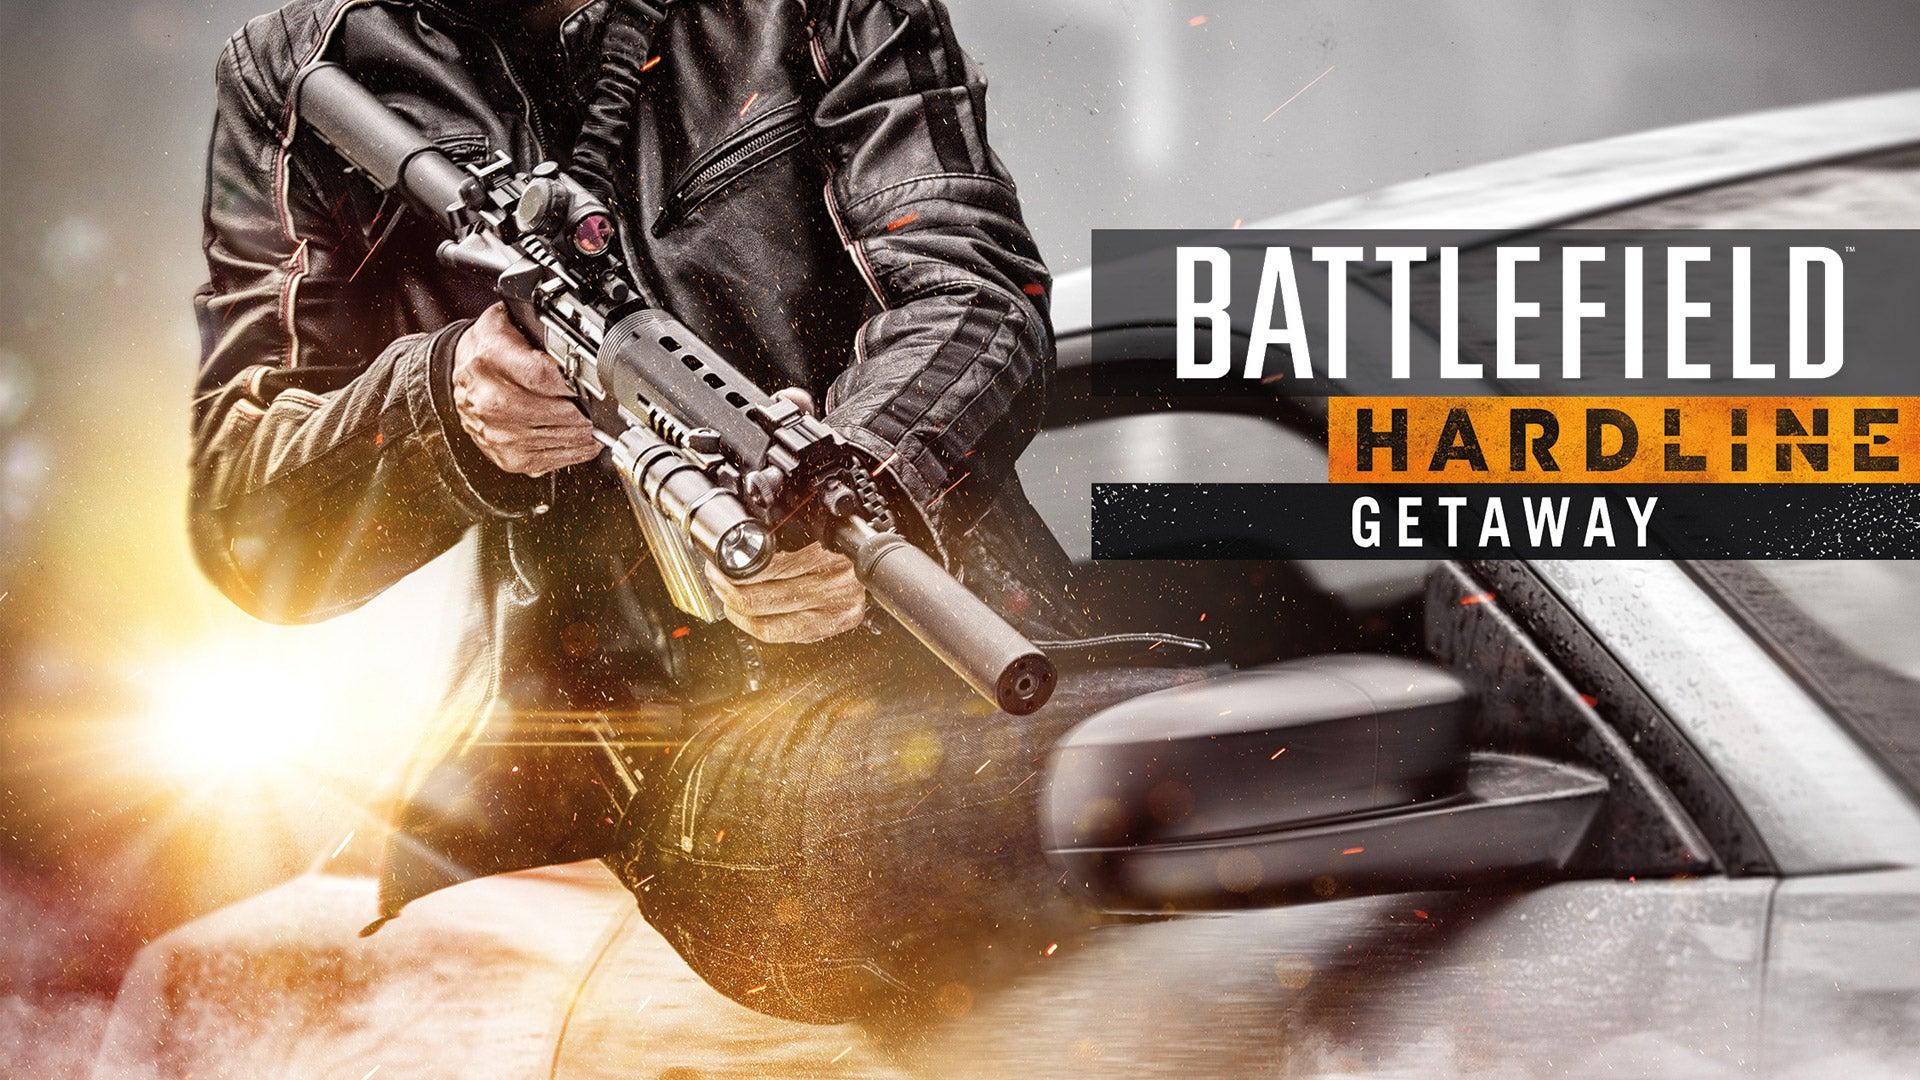 Image for Battlefield Hardline Getaway DLC coming January